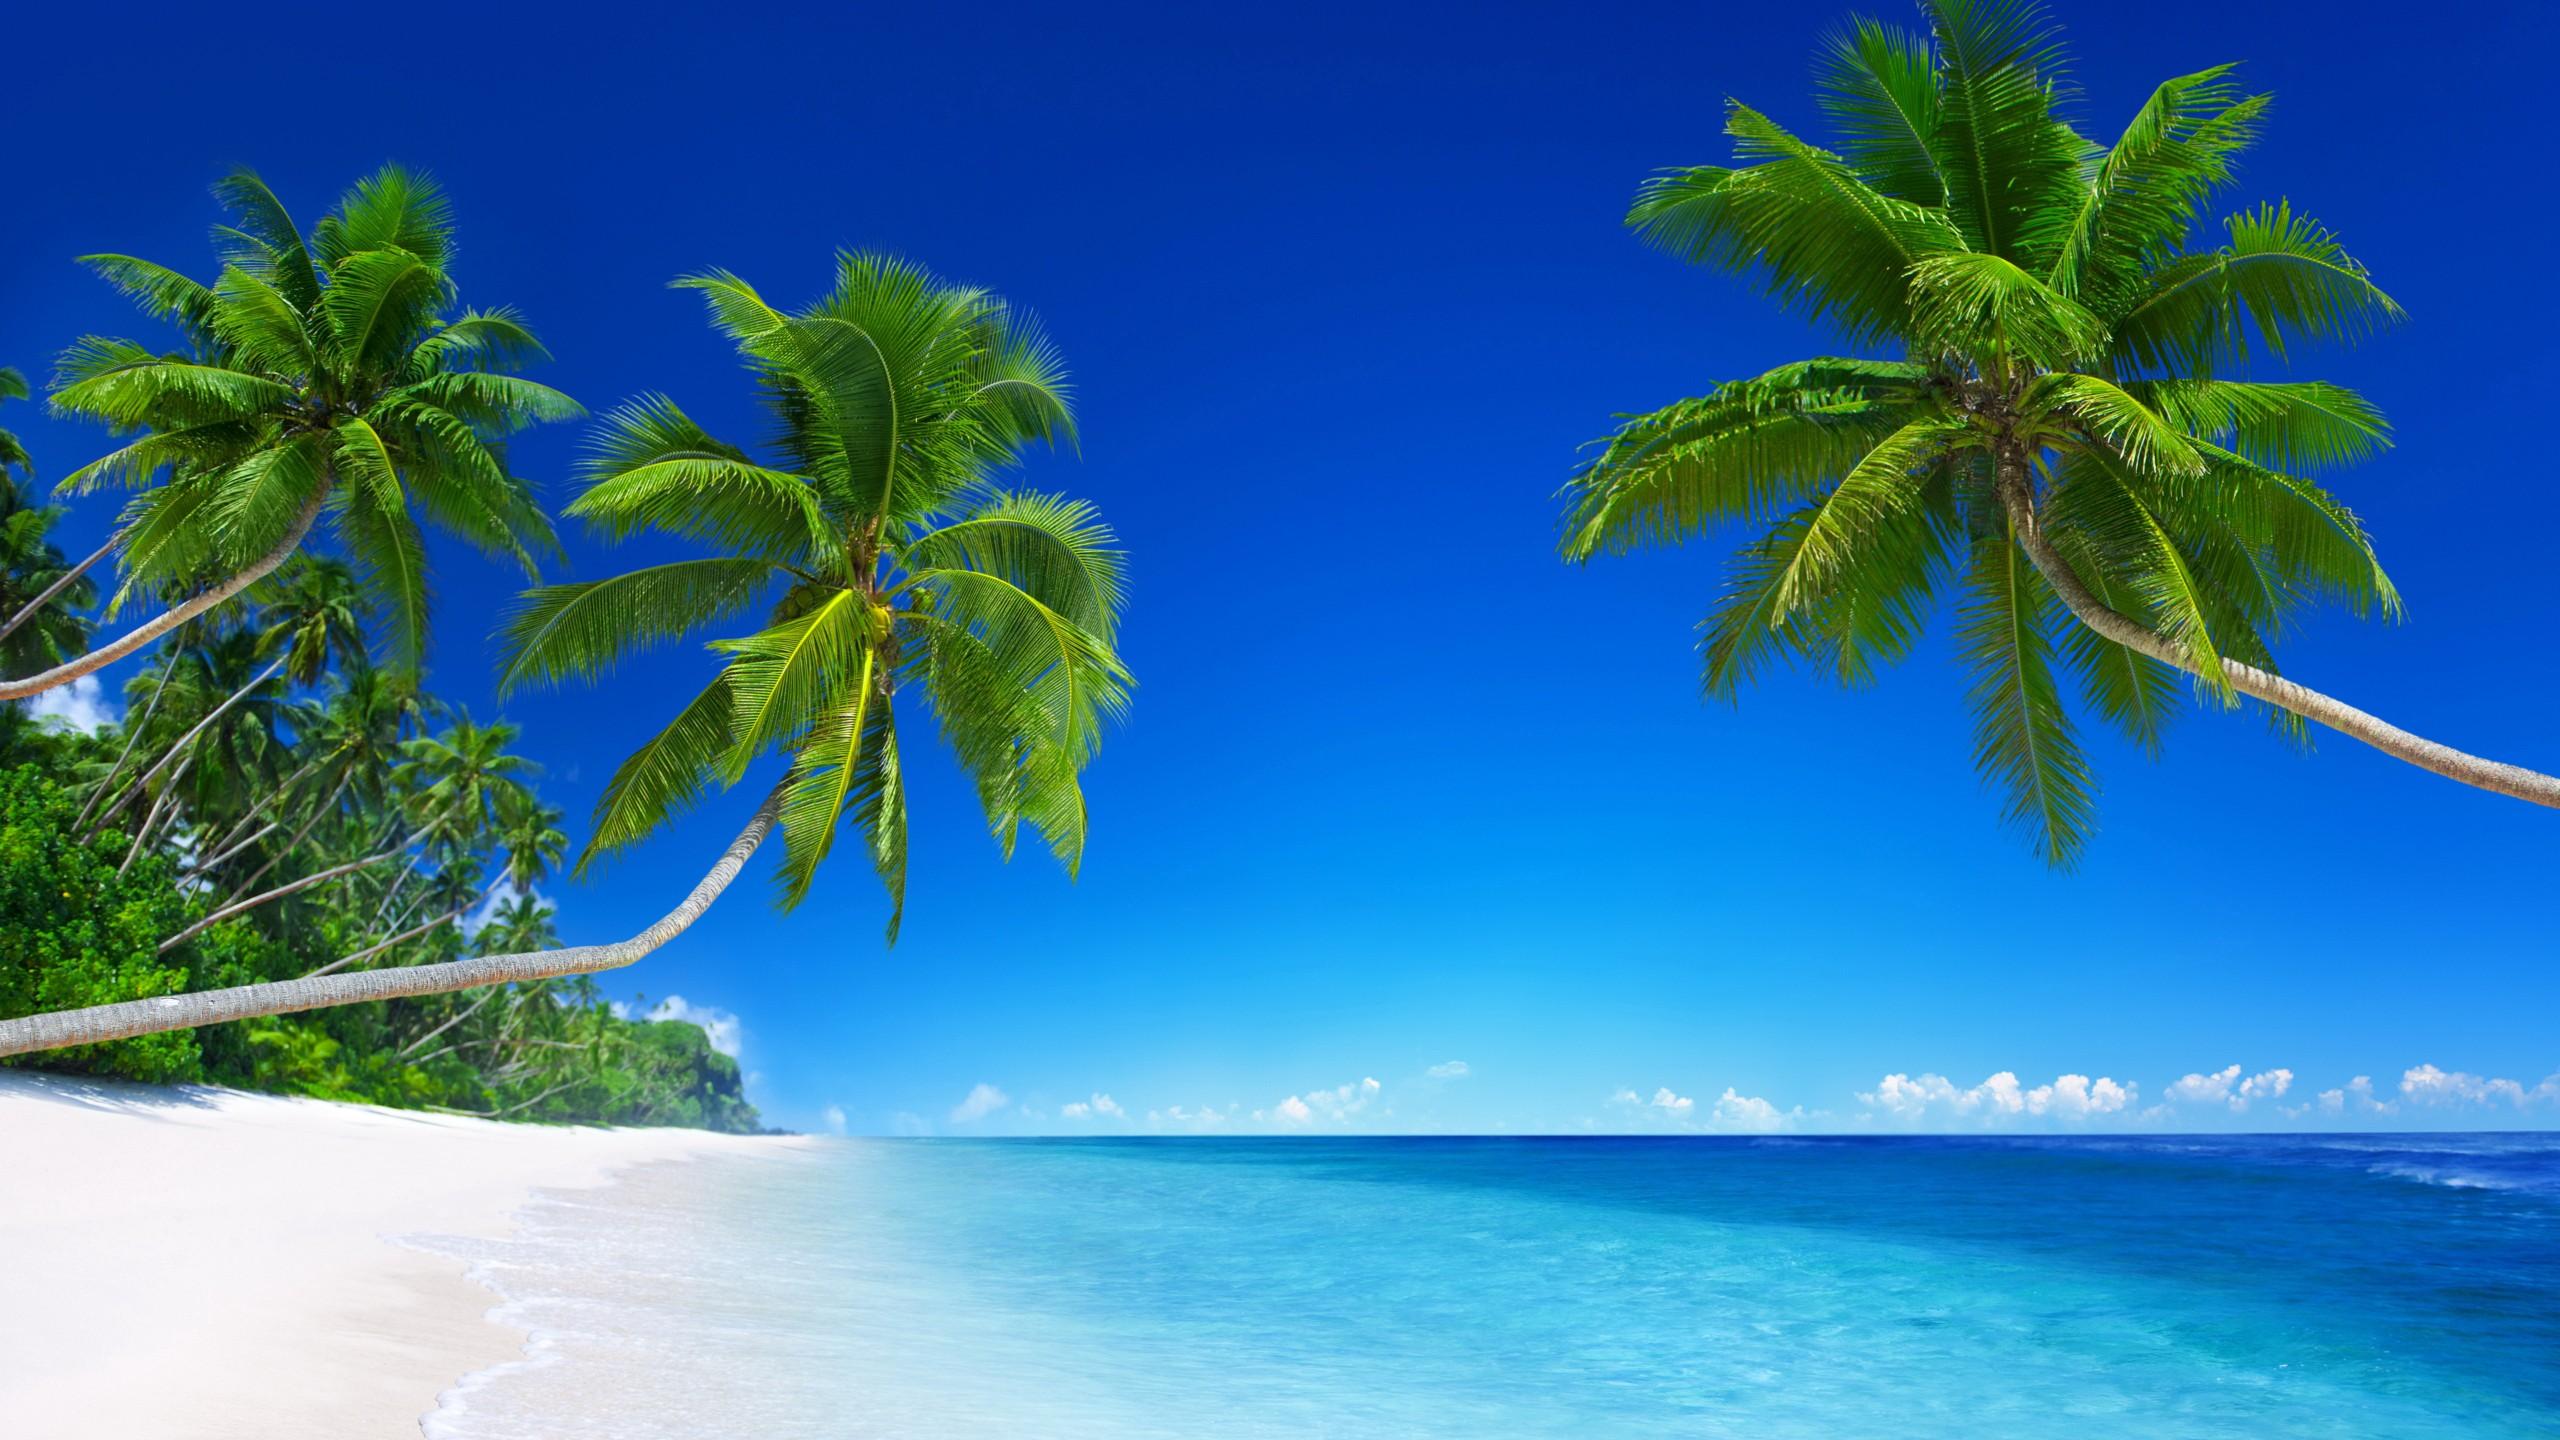 Iphone Wallpaper Beach Girl Tropical Beach Paradise 5k Wallpapers Hd Wallpapers Id